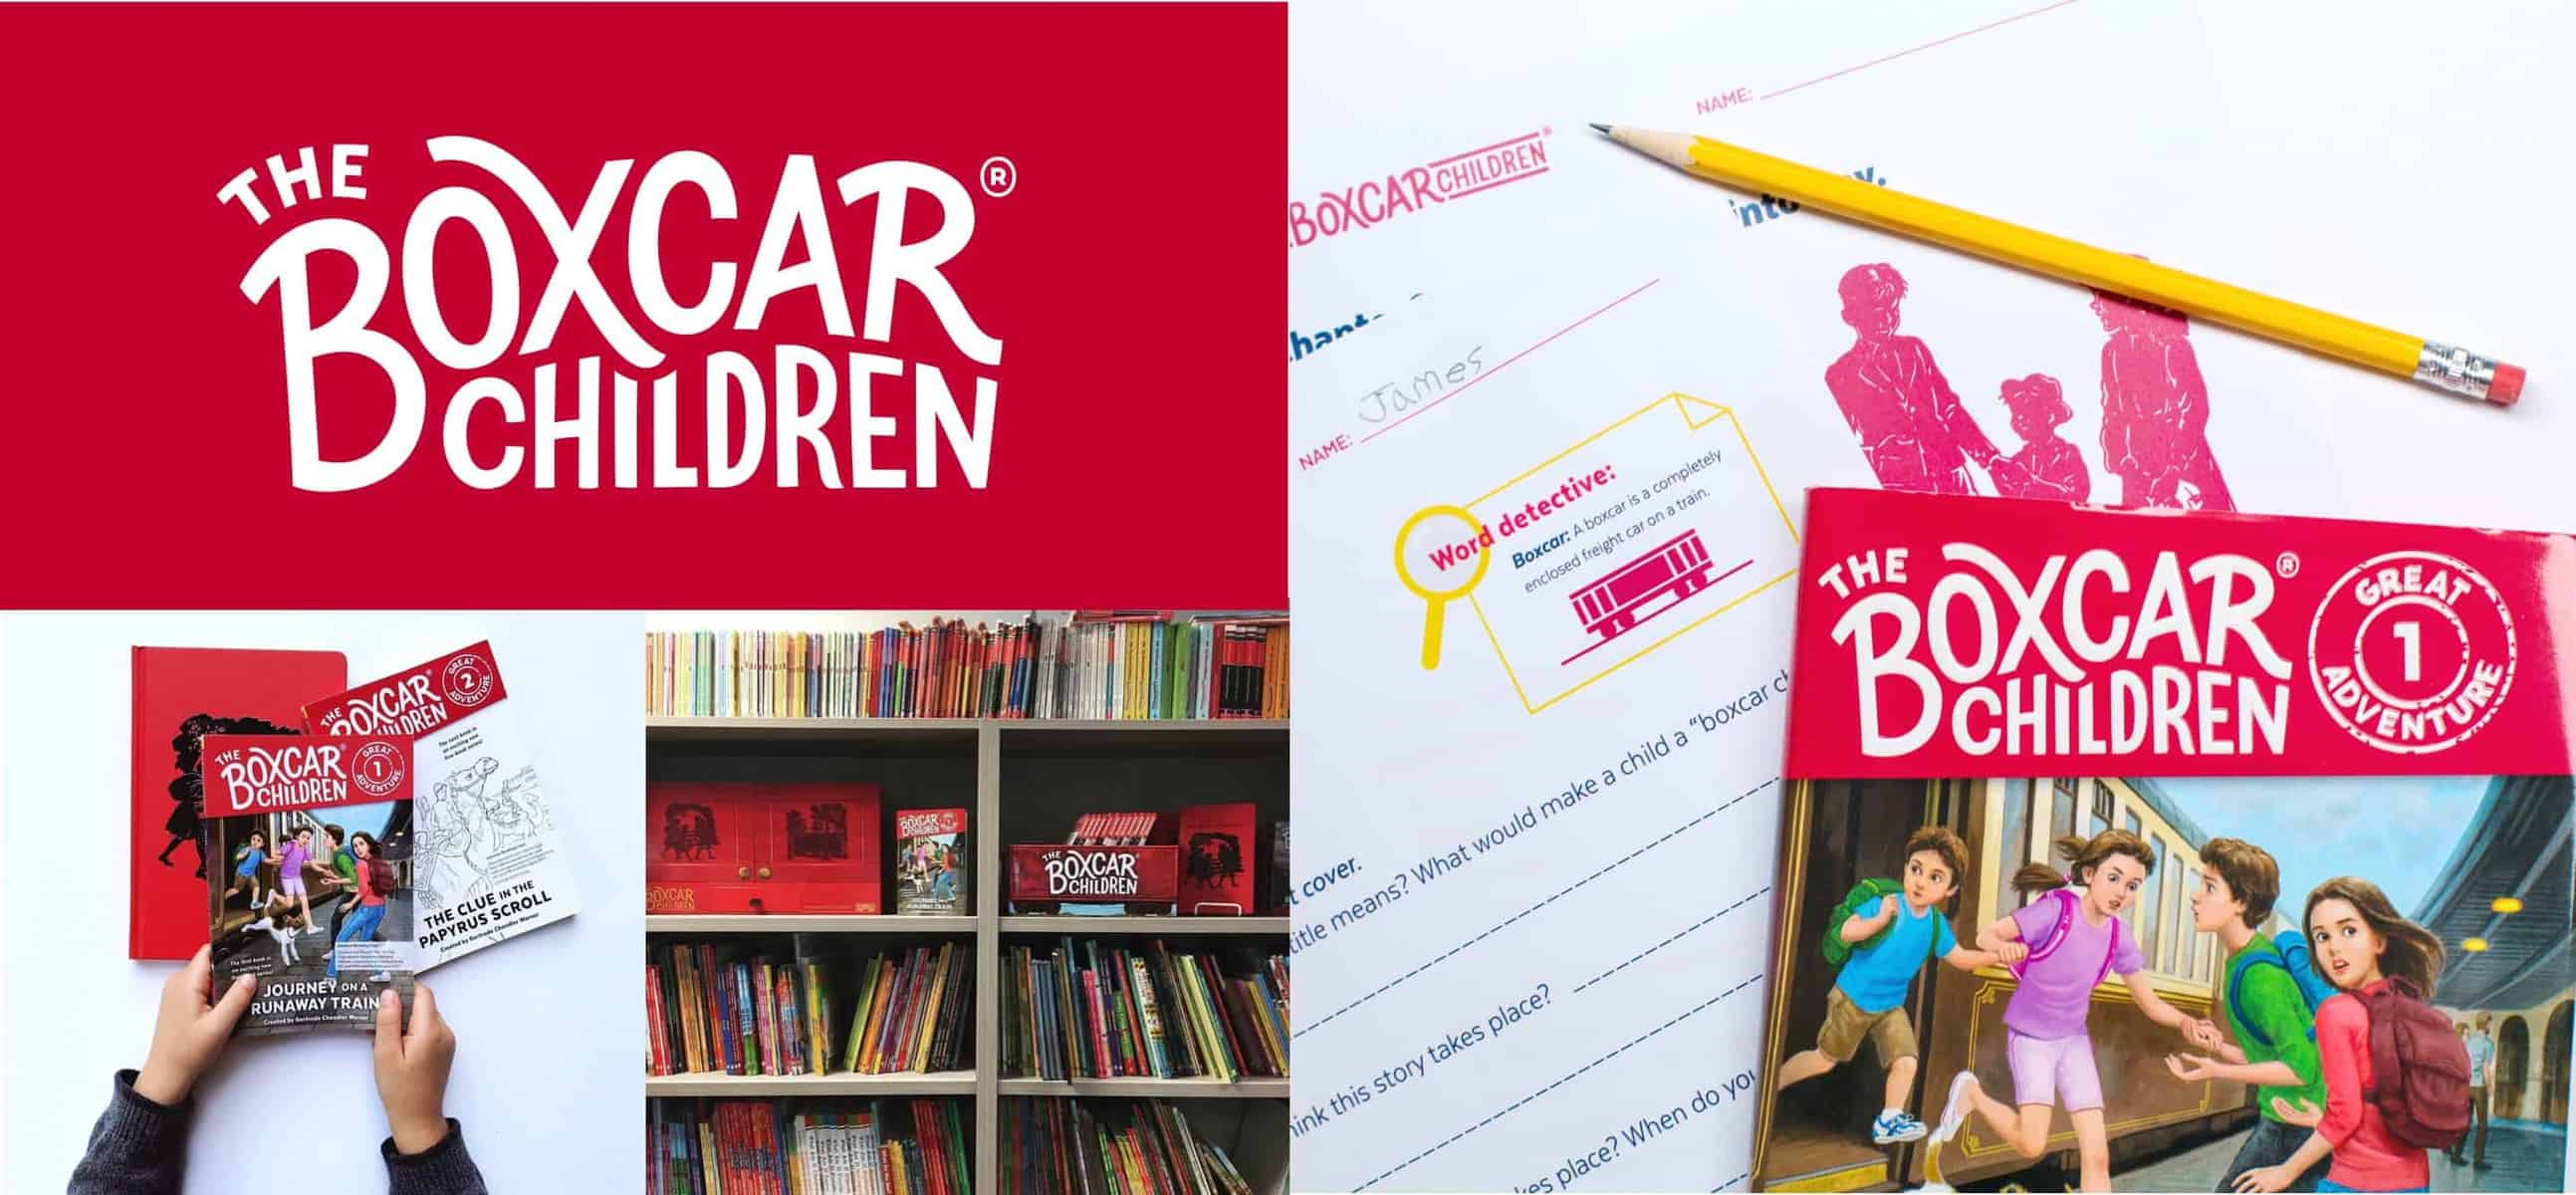 Boxcar children work books